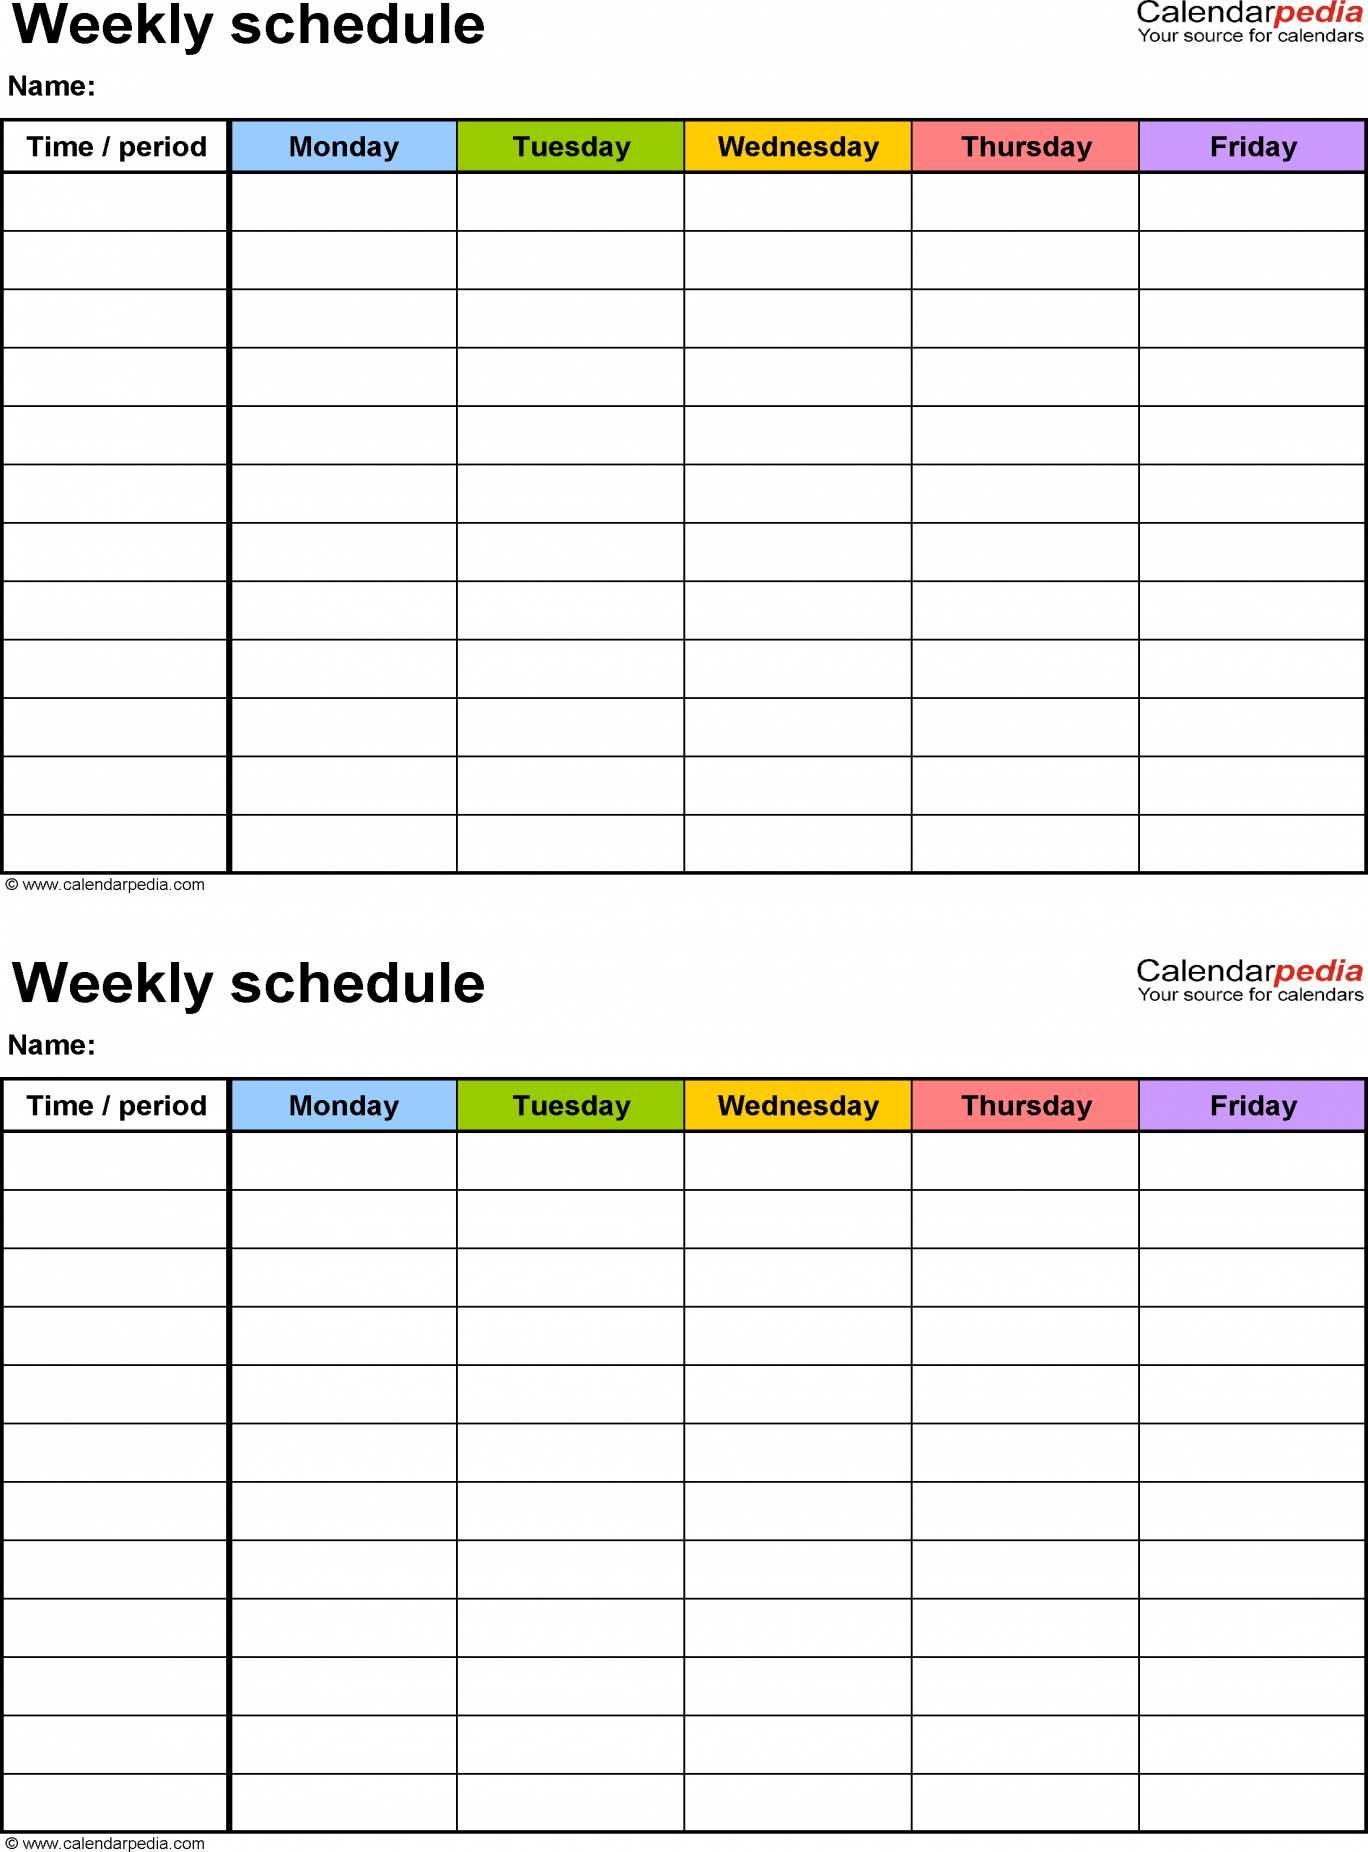 Monthly Calendar Schedule Template Spreadsheet Google Sheets